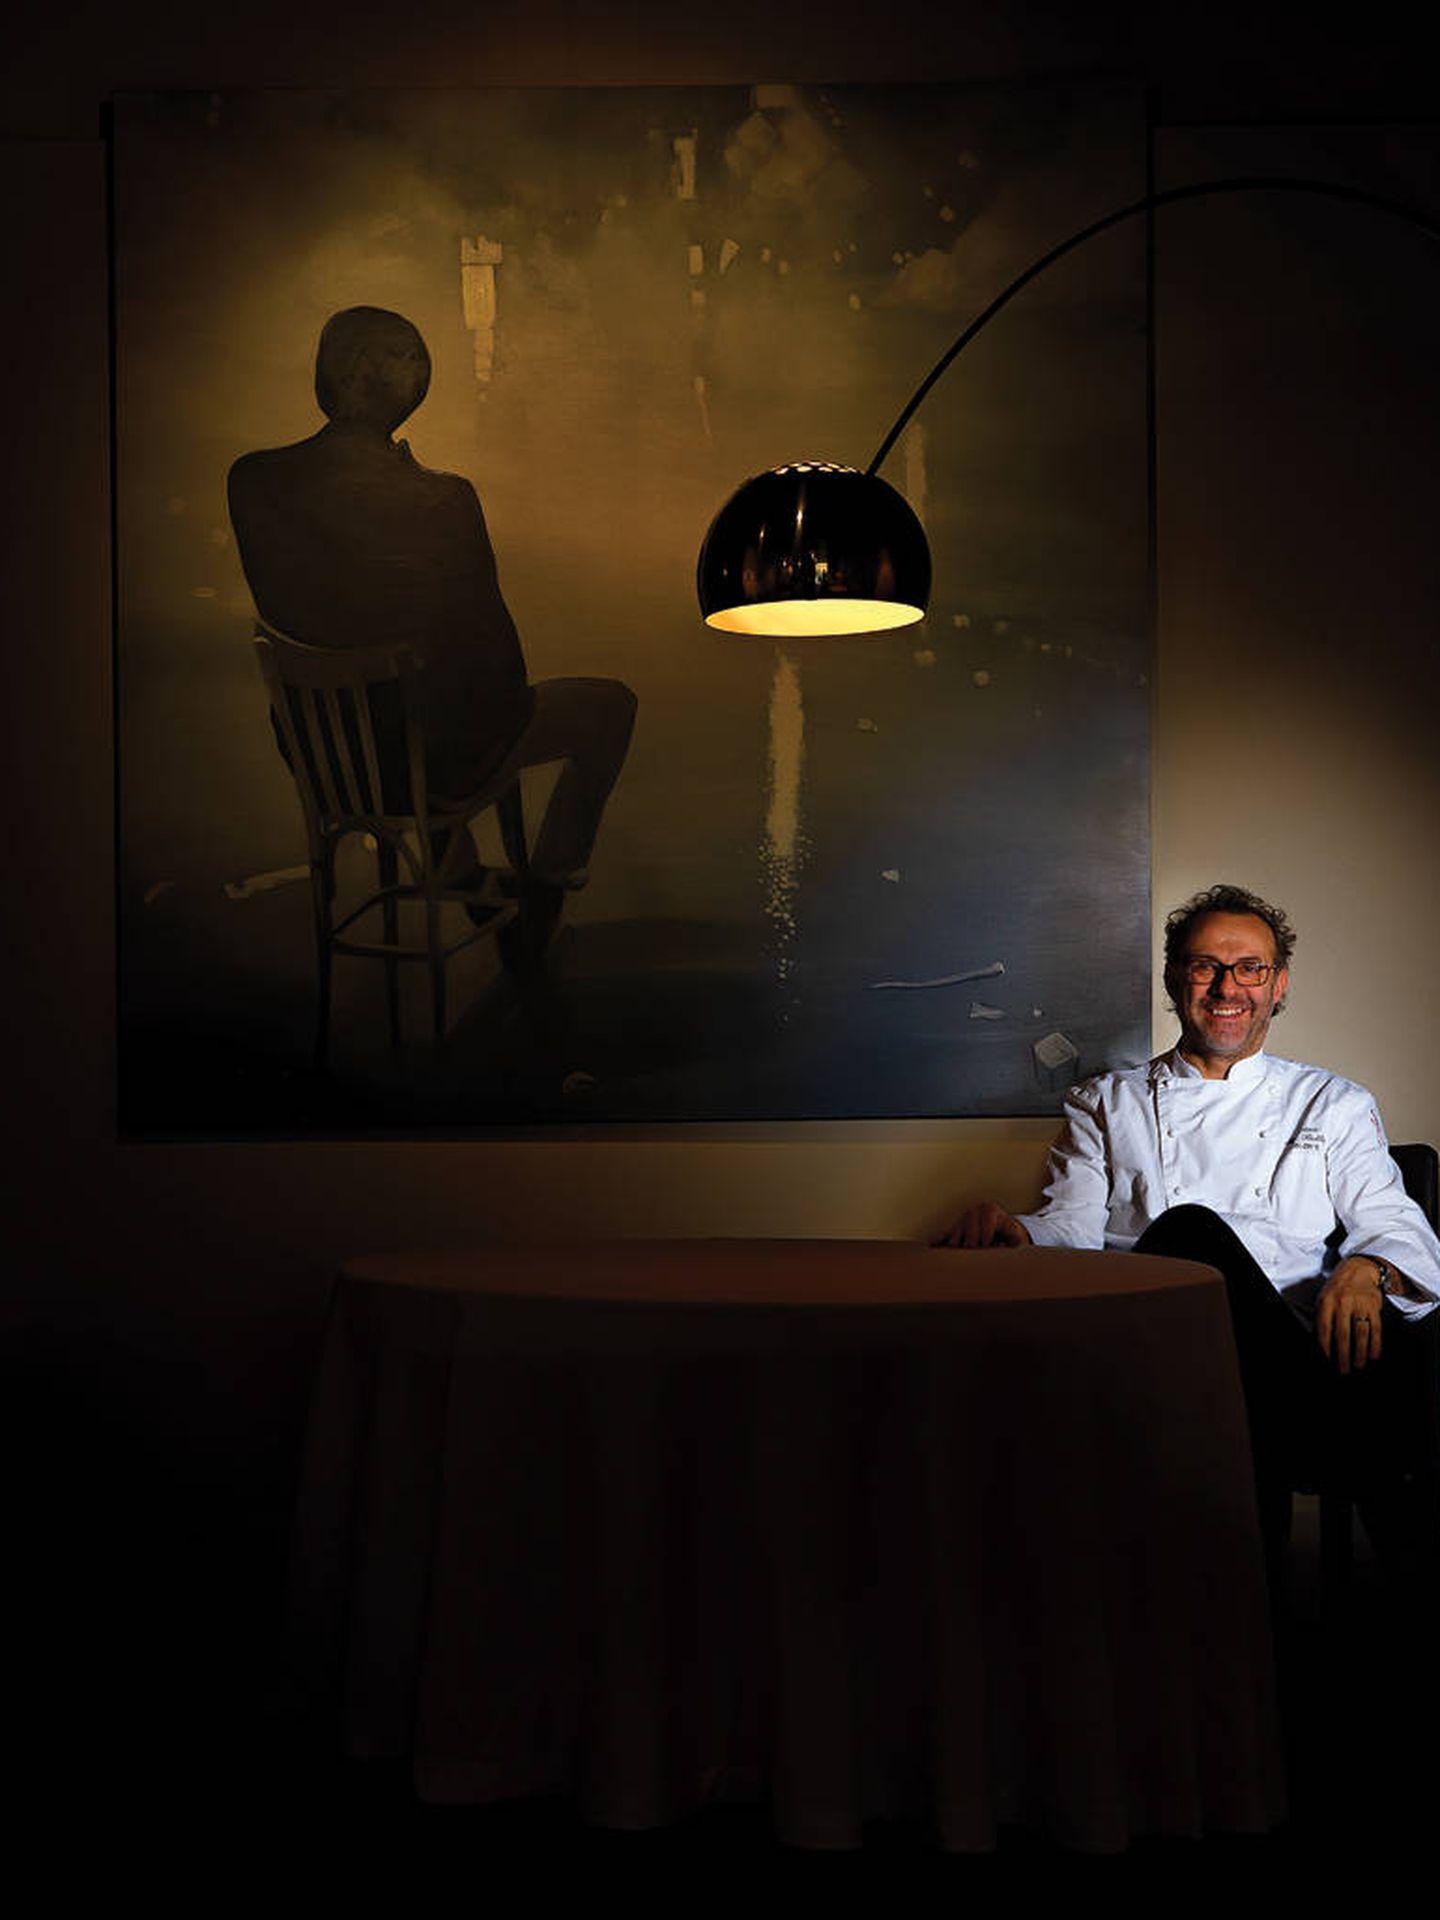 La Osteria Francescana, de Massimo Bottura, mejor restaurante del mundo